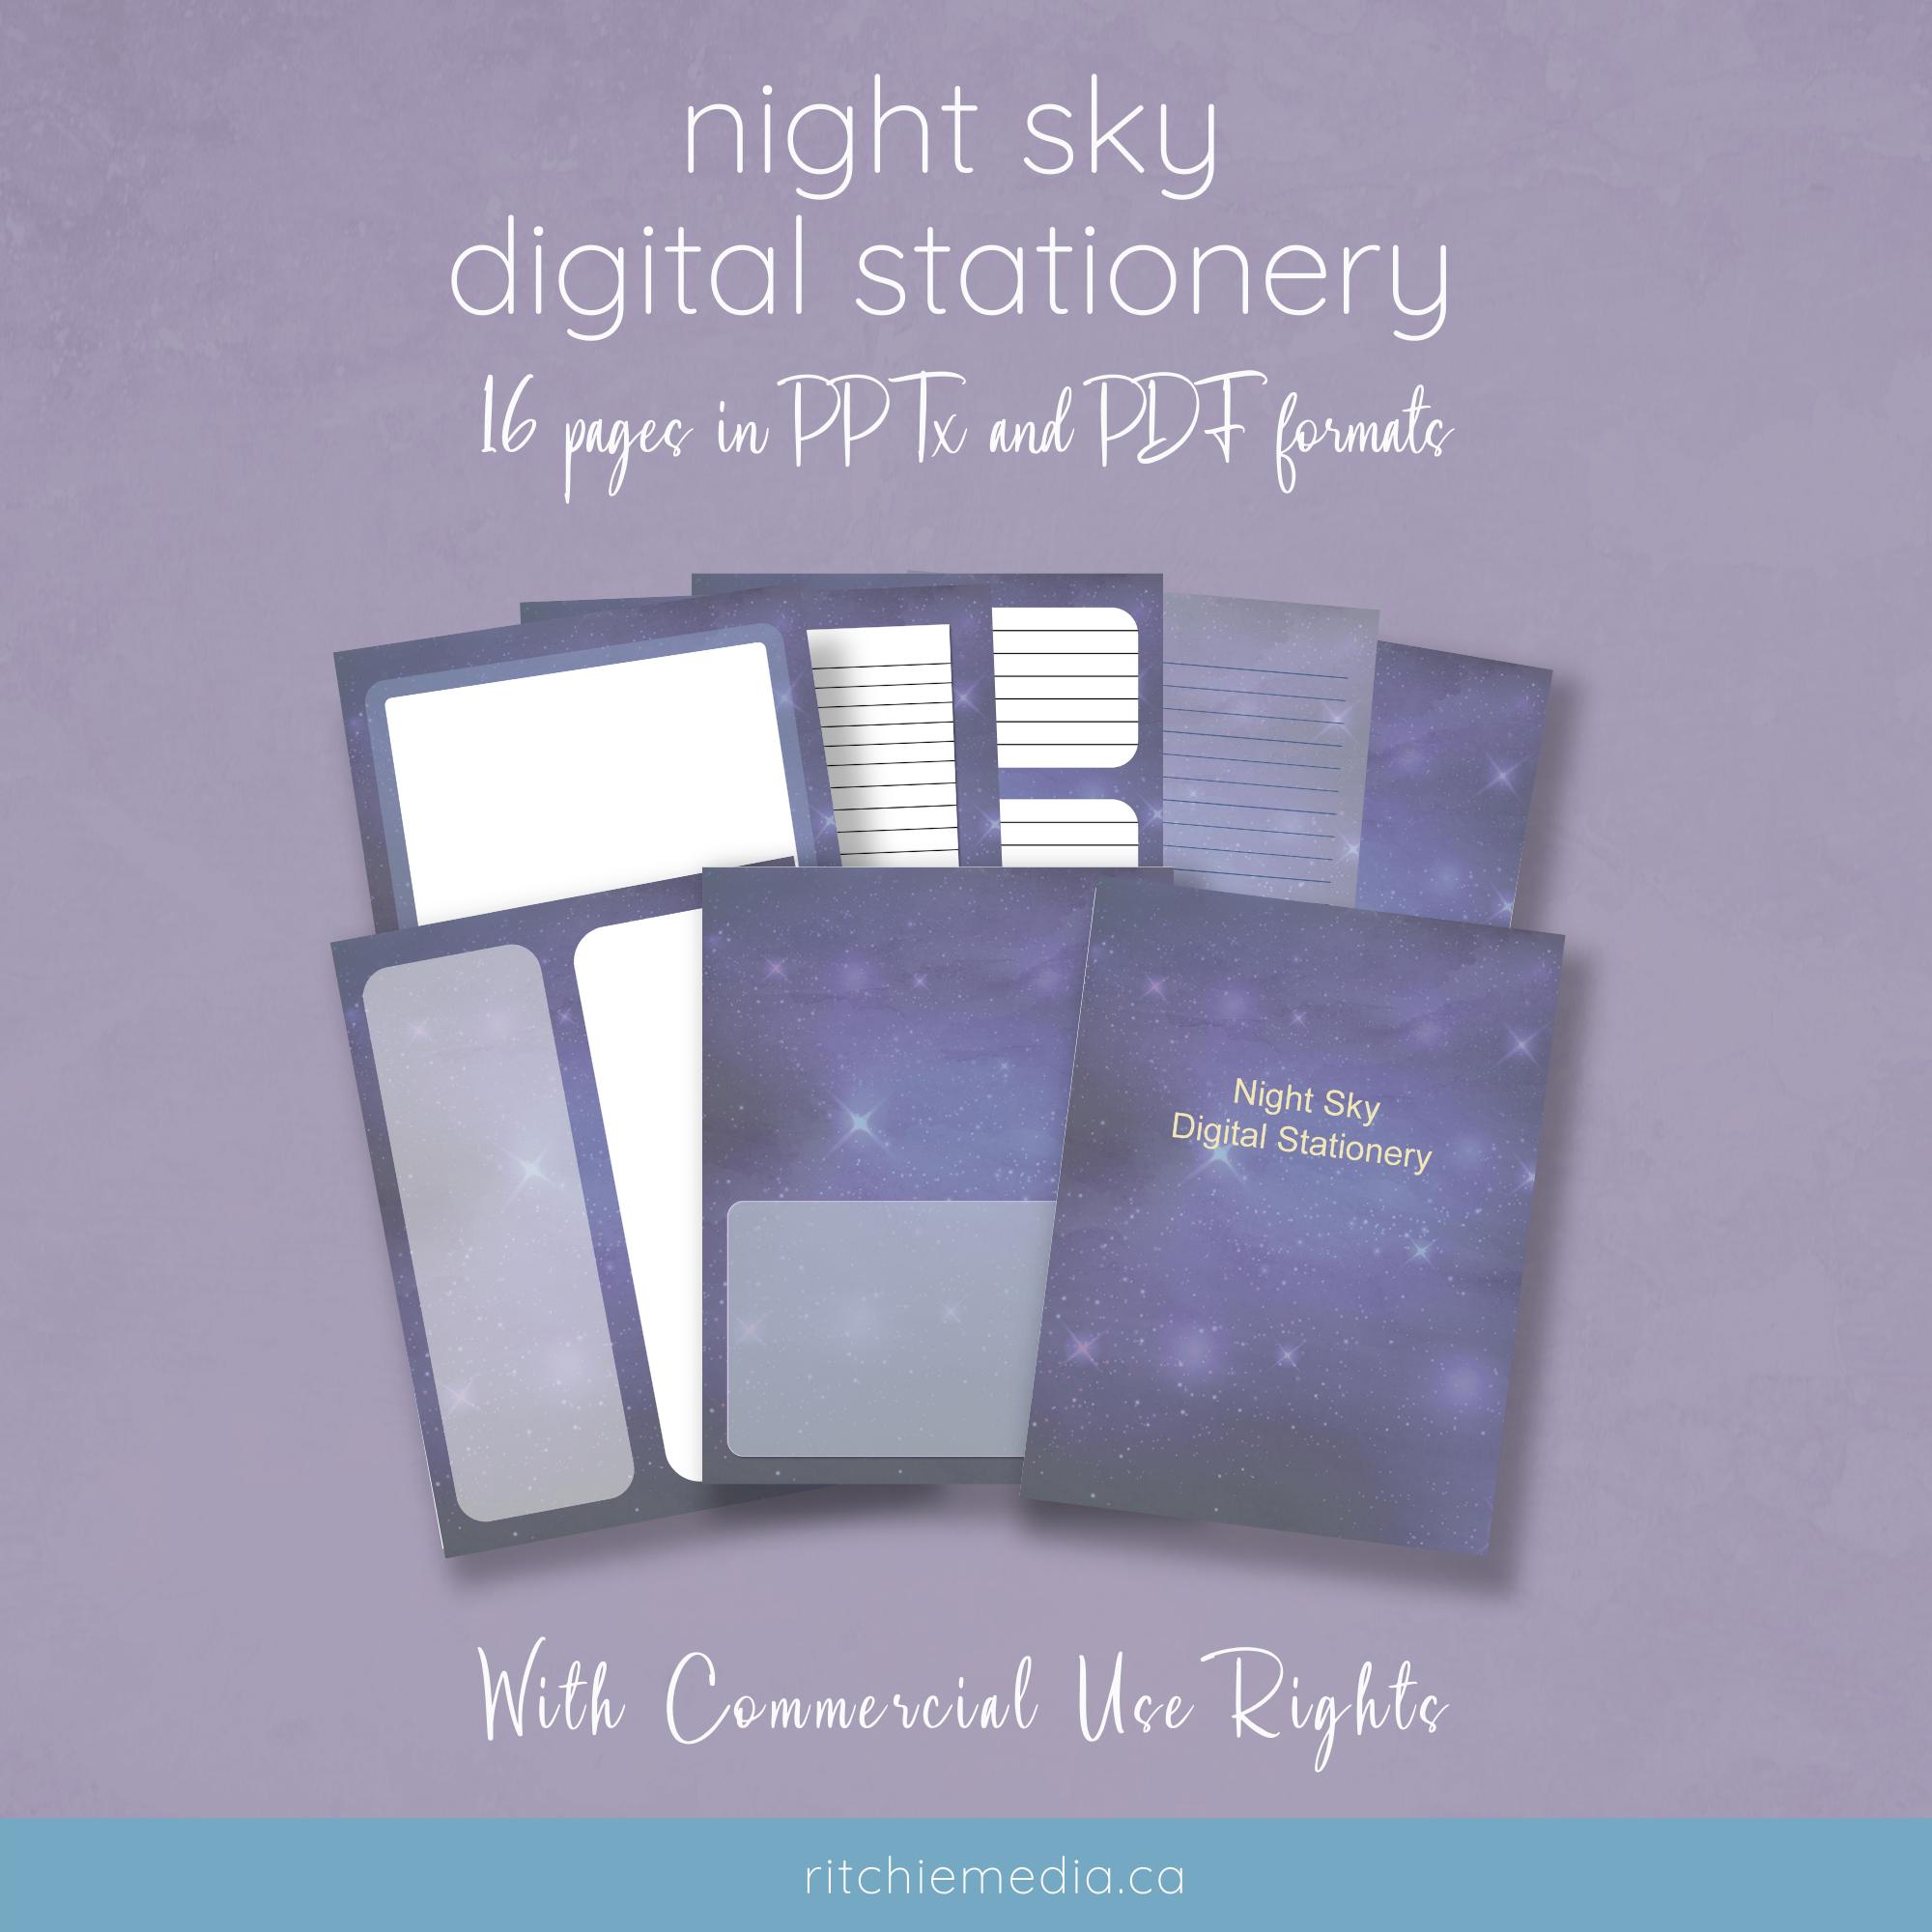 nightsky journal templates mockup